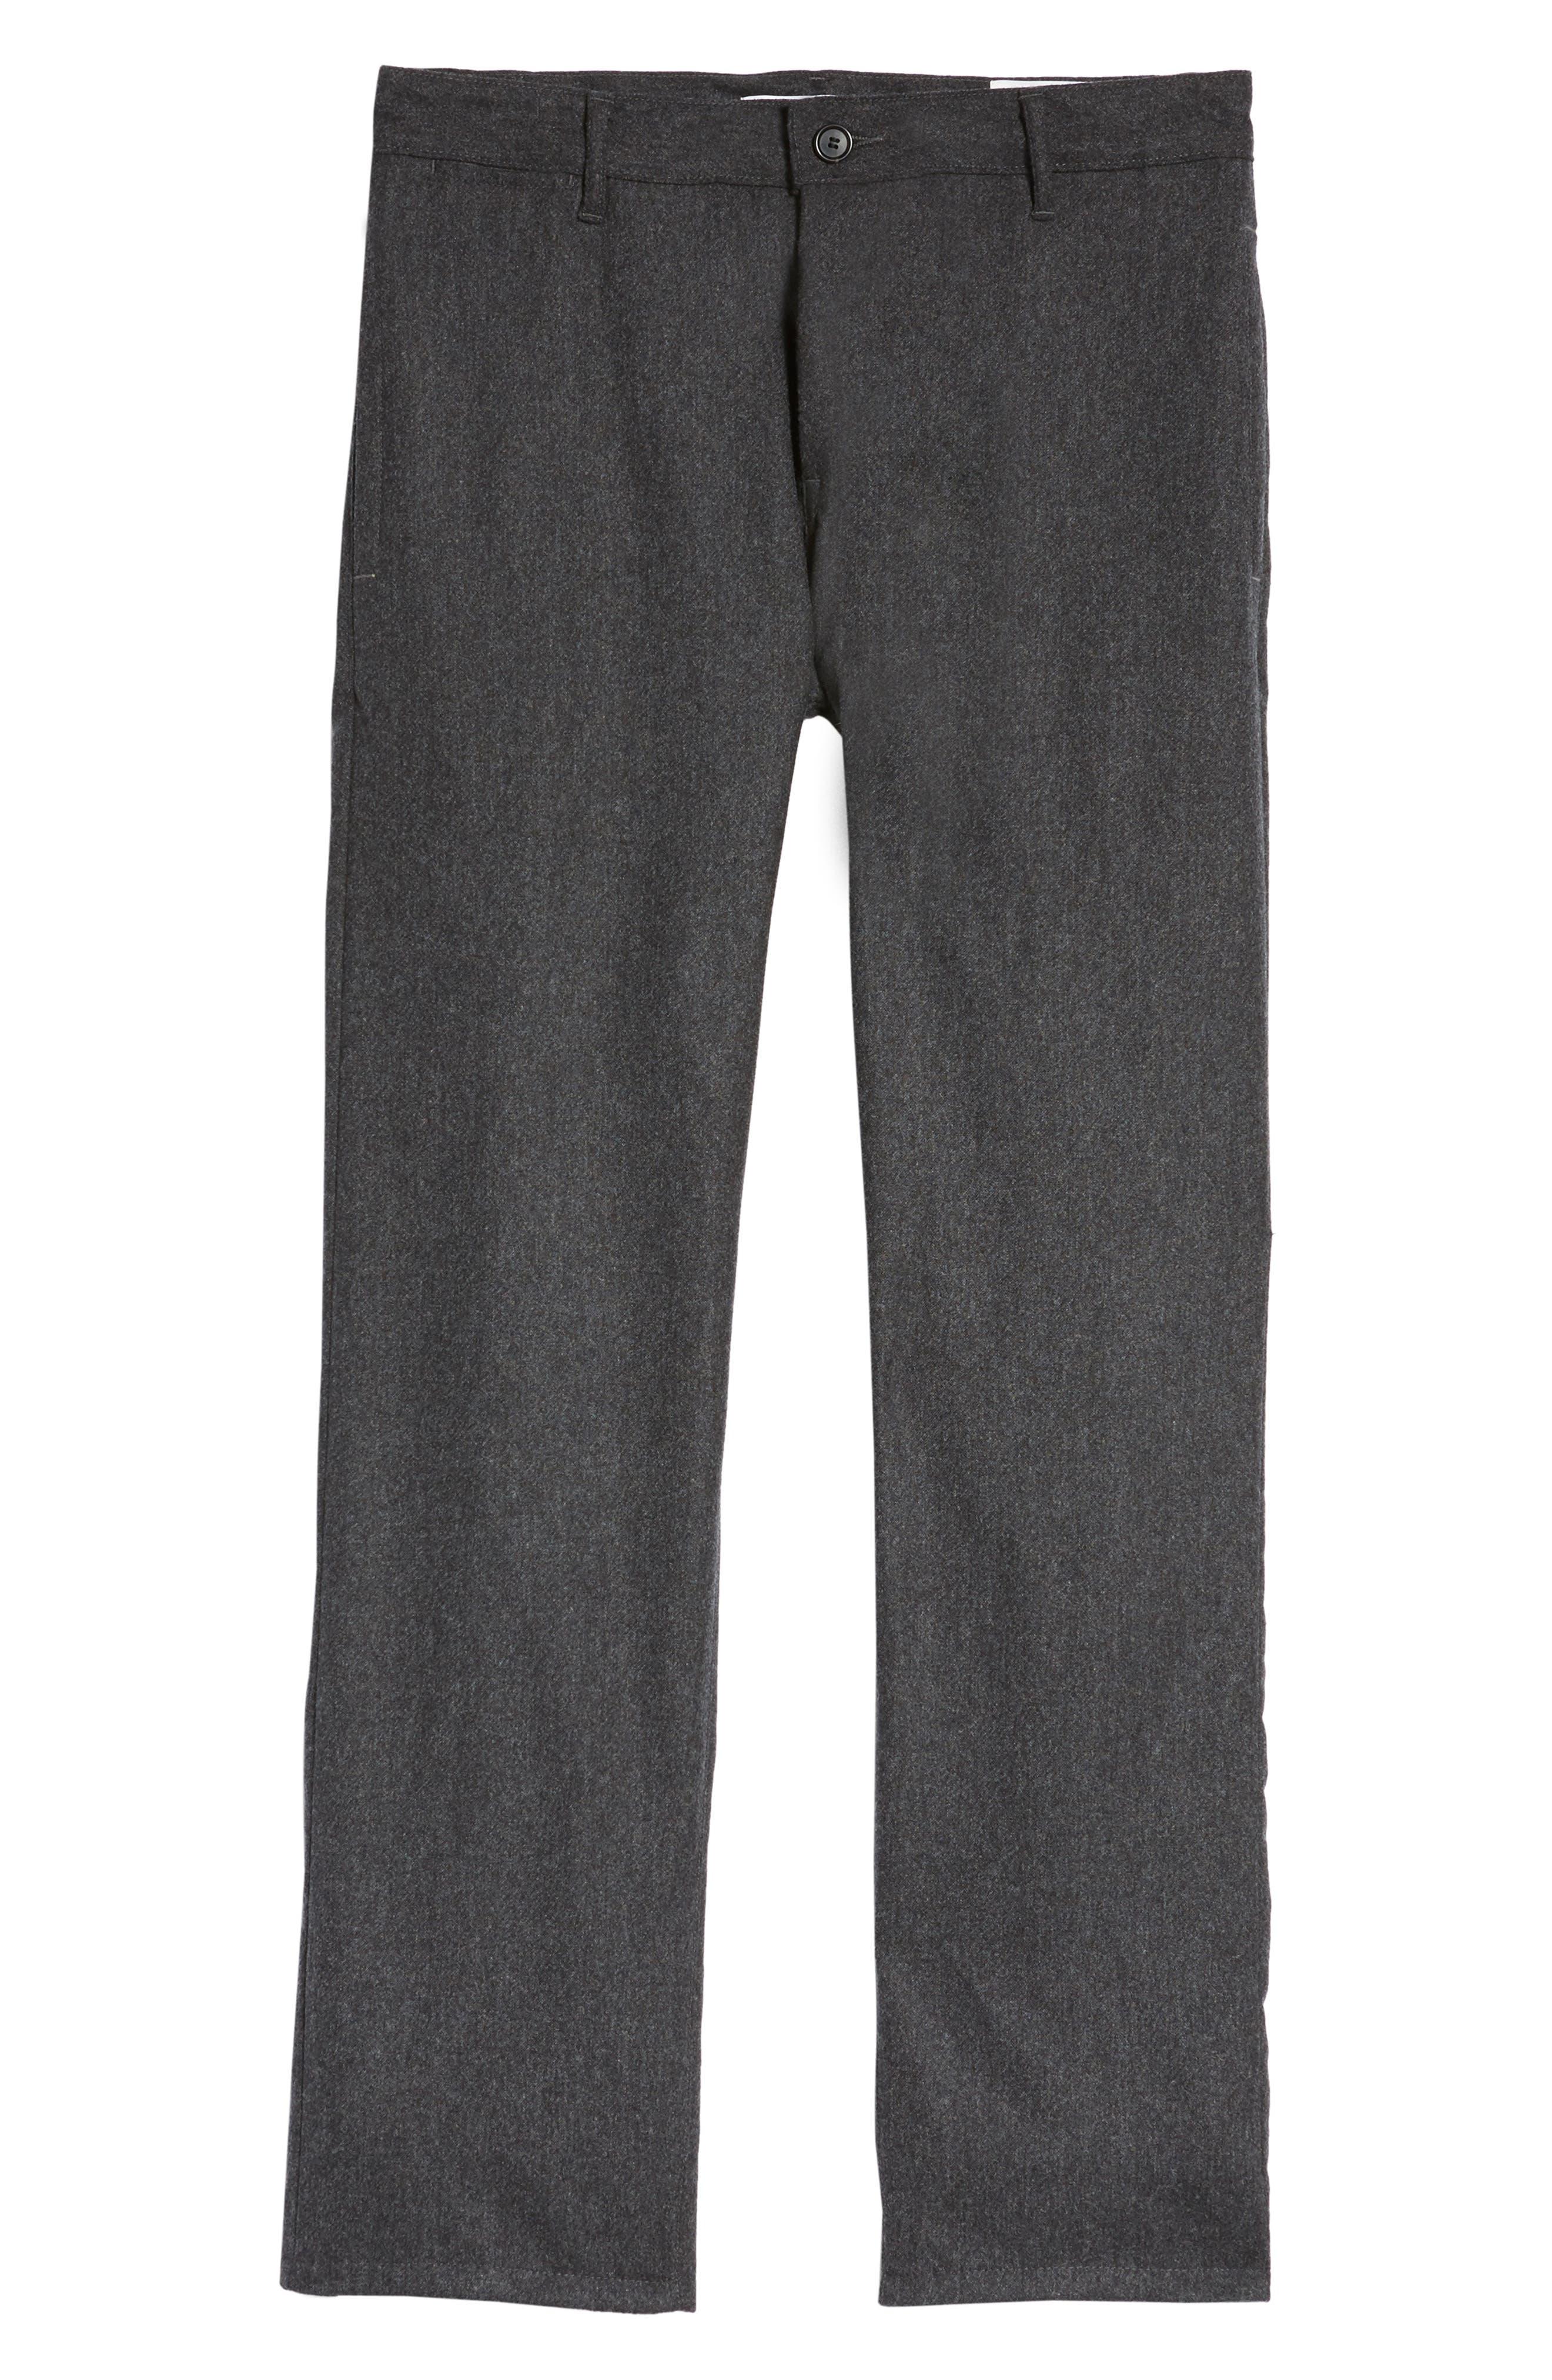 Tellis Slim Fit Five-Pocket Pants,                             Alternate thumbnail 6, color,                             Dark Ridge